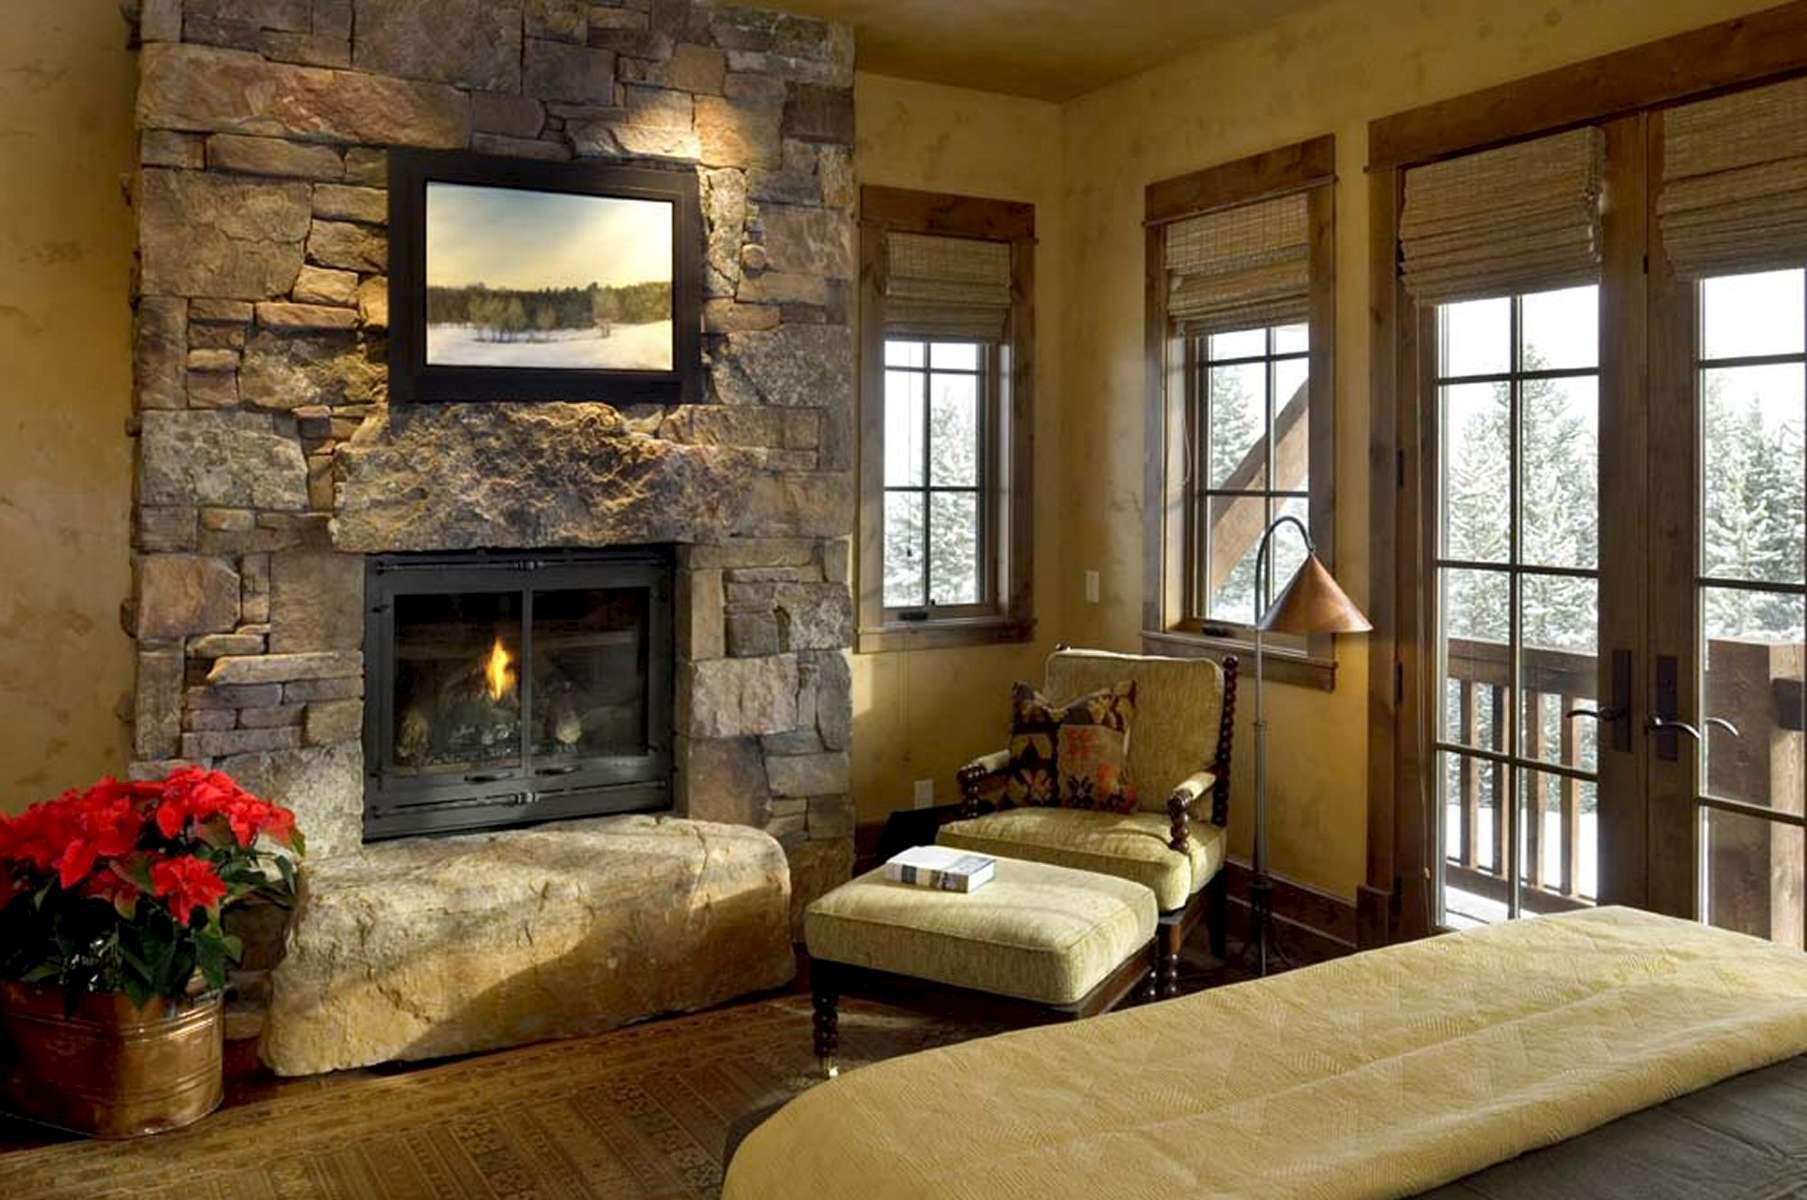 plan-west-design-firm-_-interiors-228